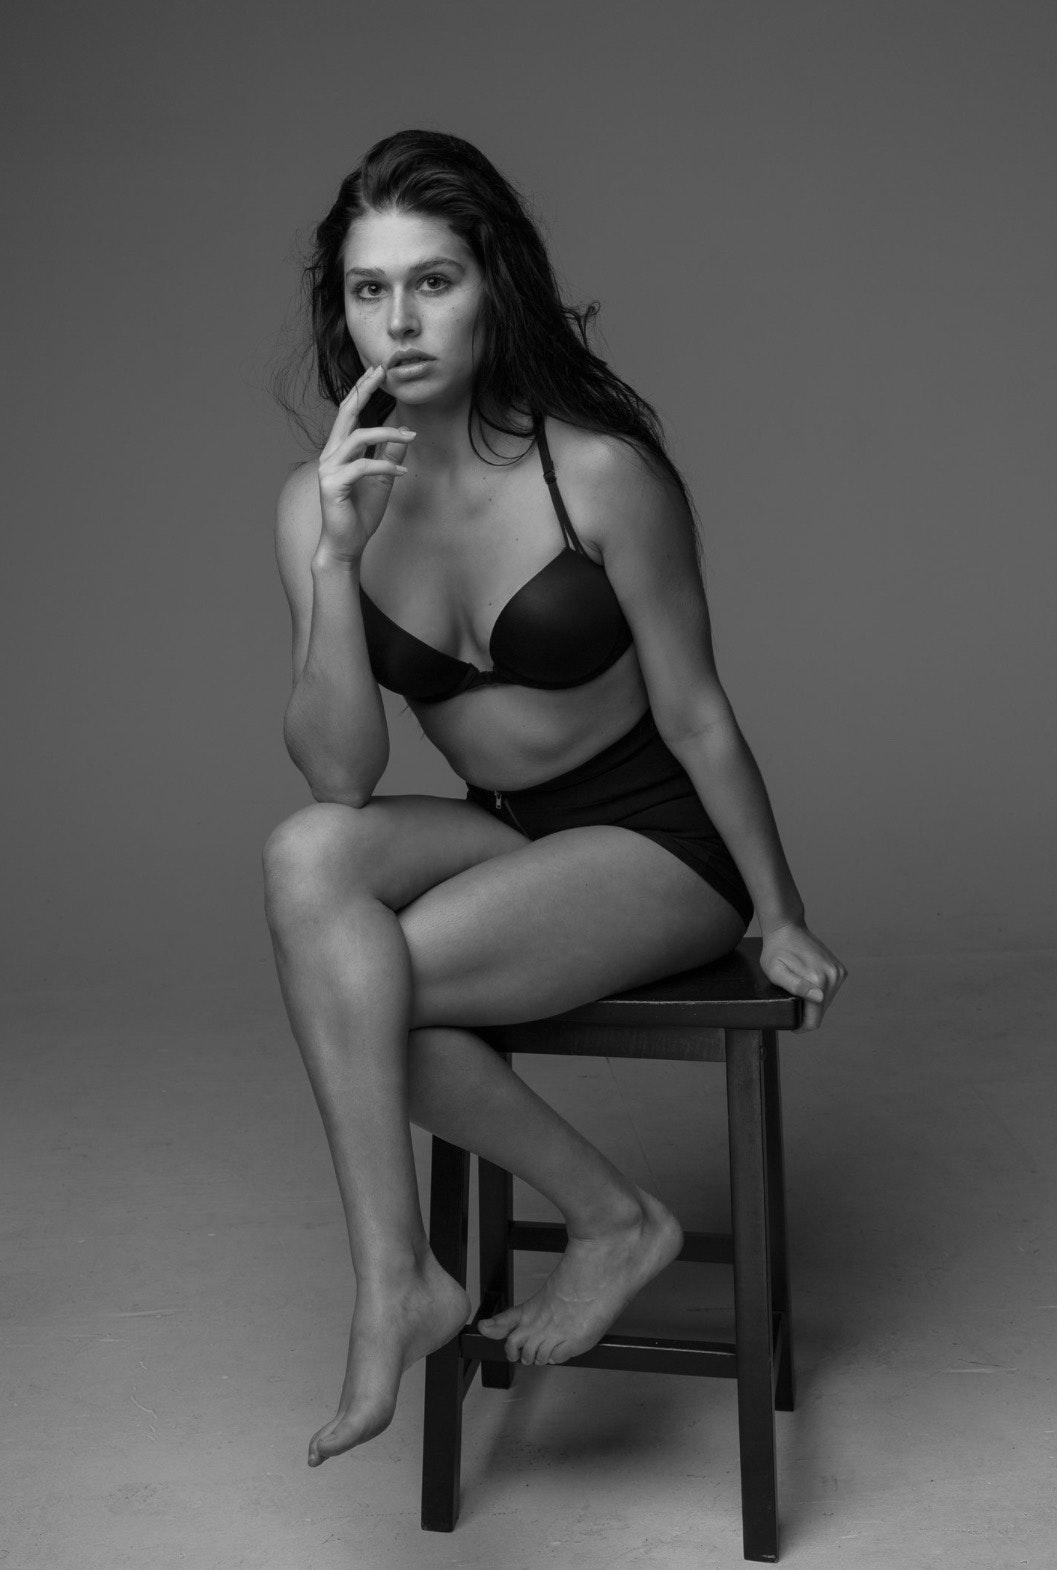 Alexandra lee's Model portfolio